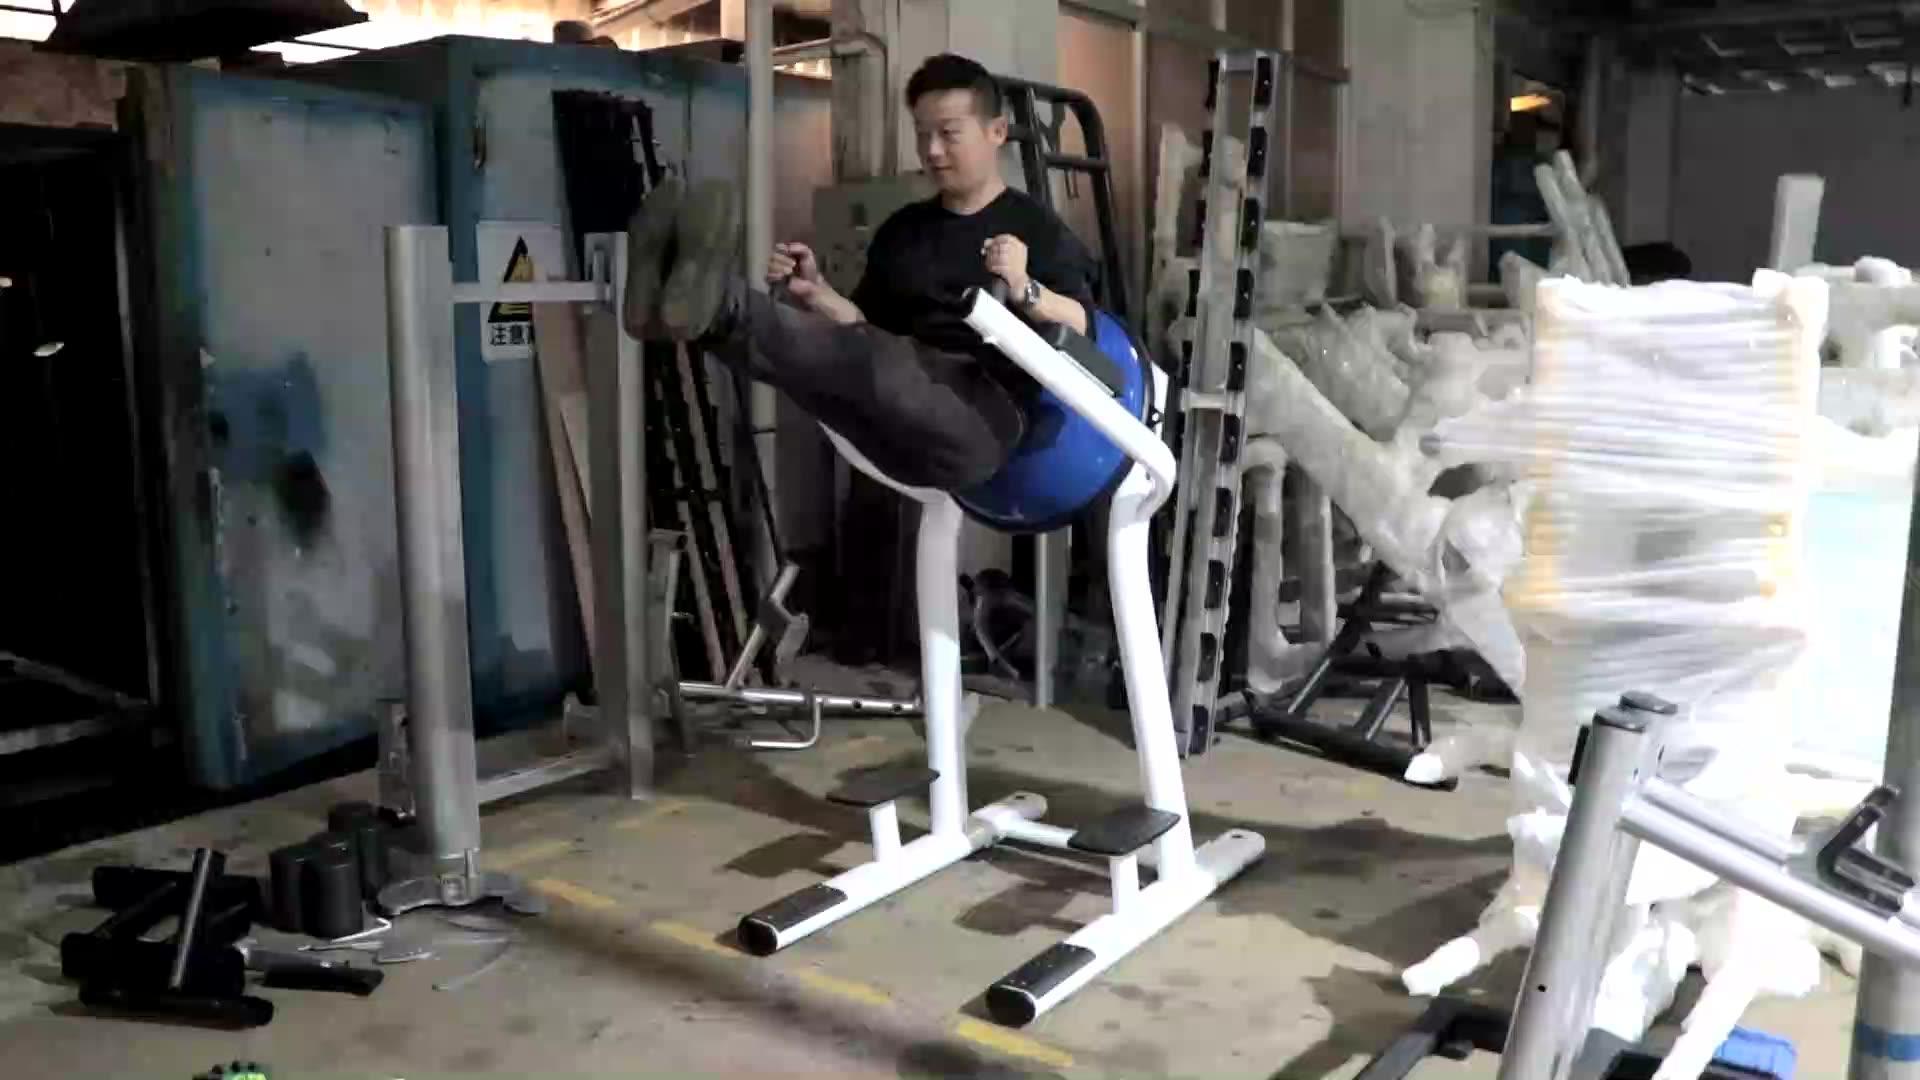 LJ-5132 Leg raise with bosu ball